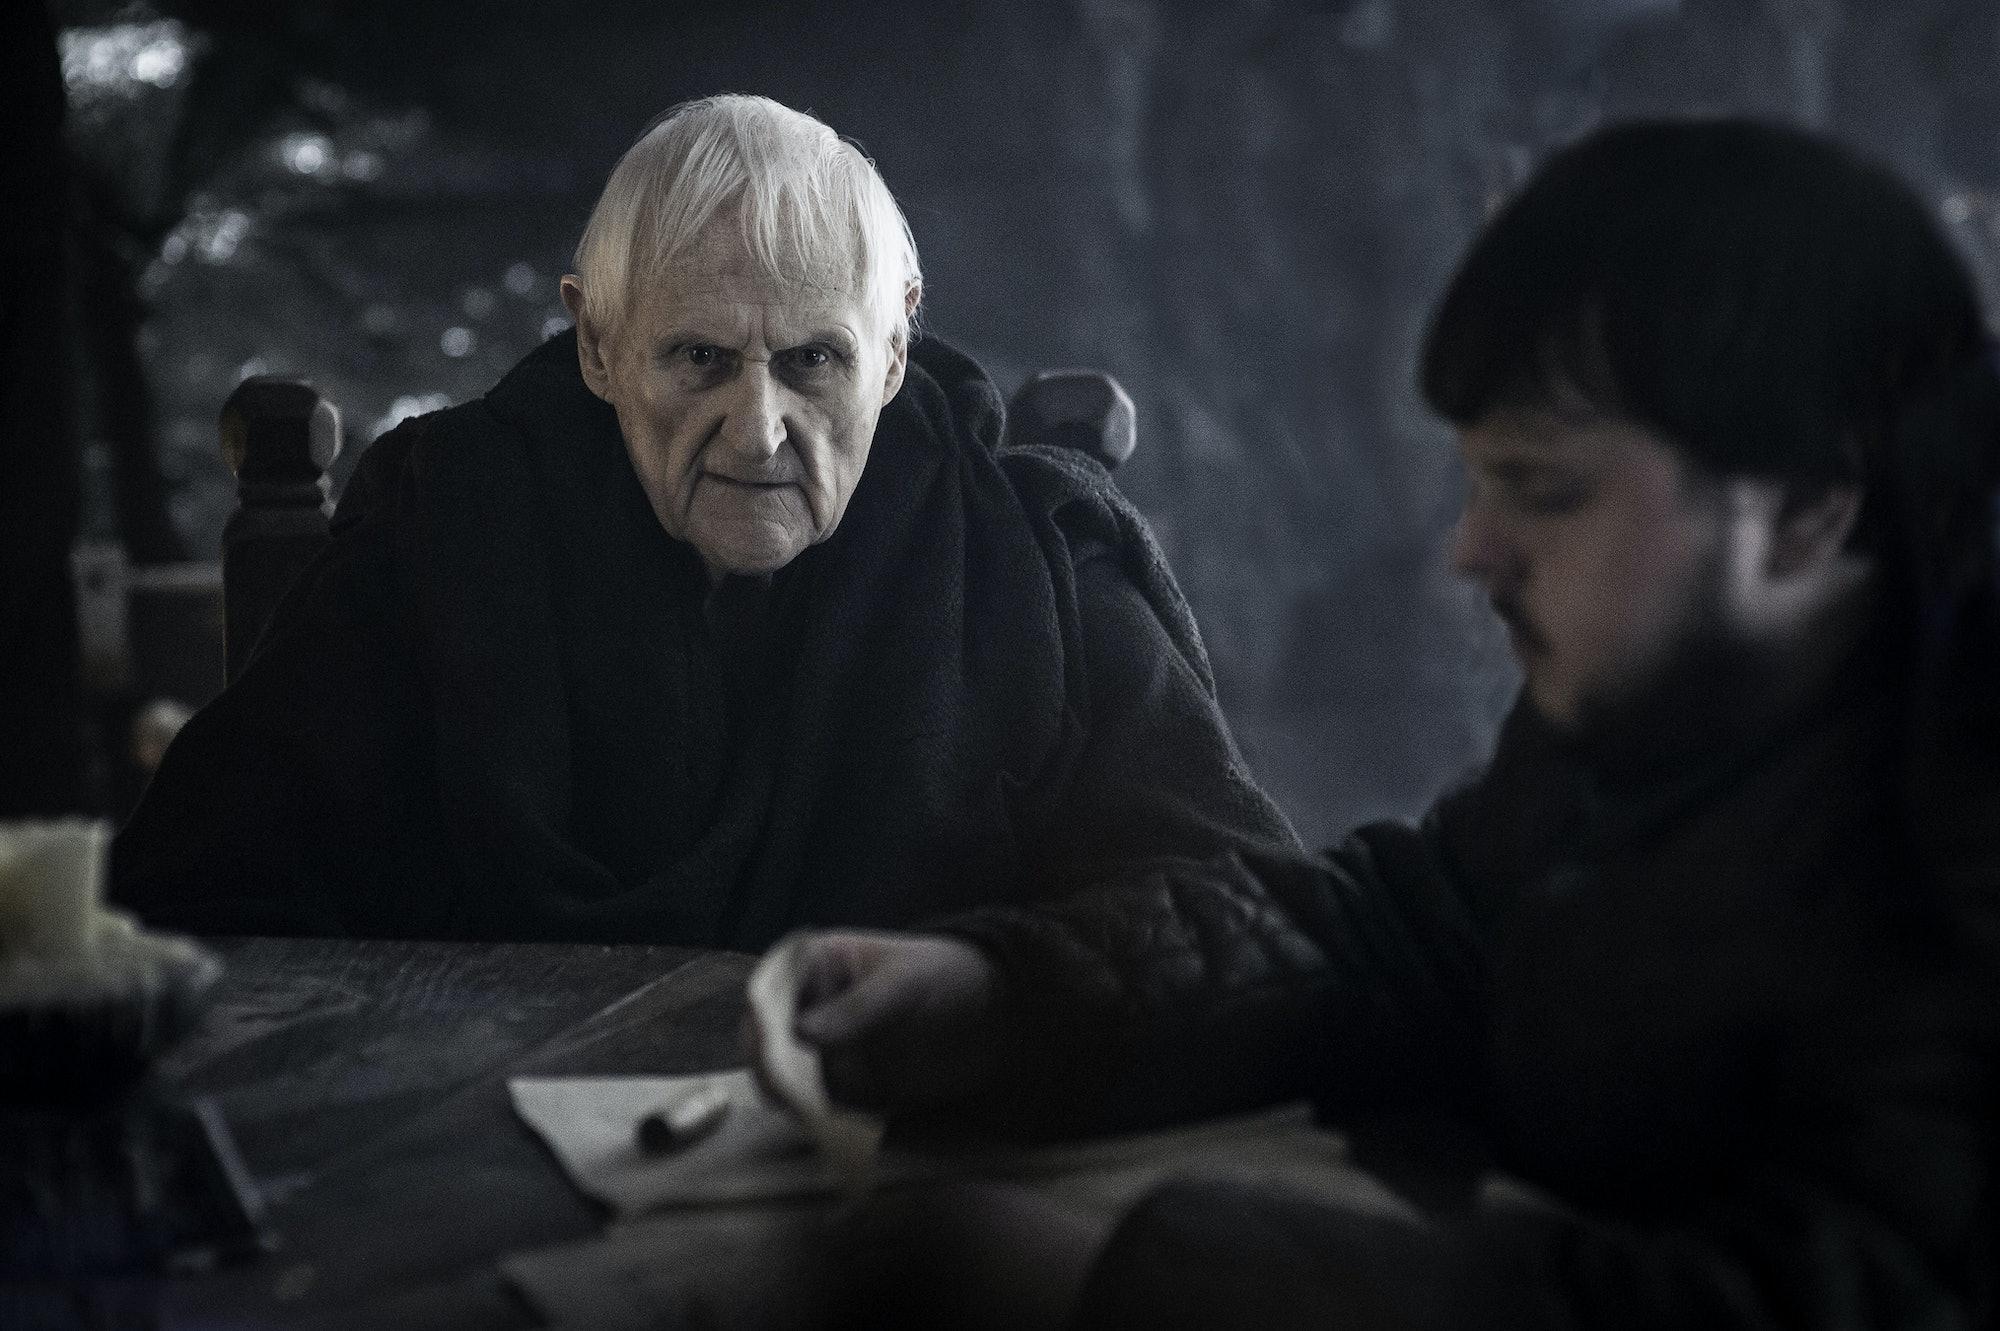 Game of Thrones Maester Aemon